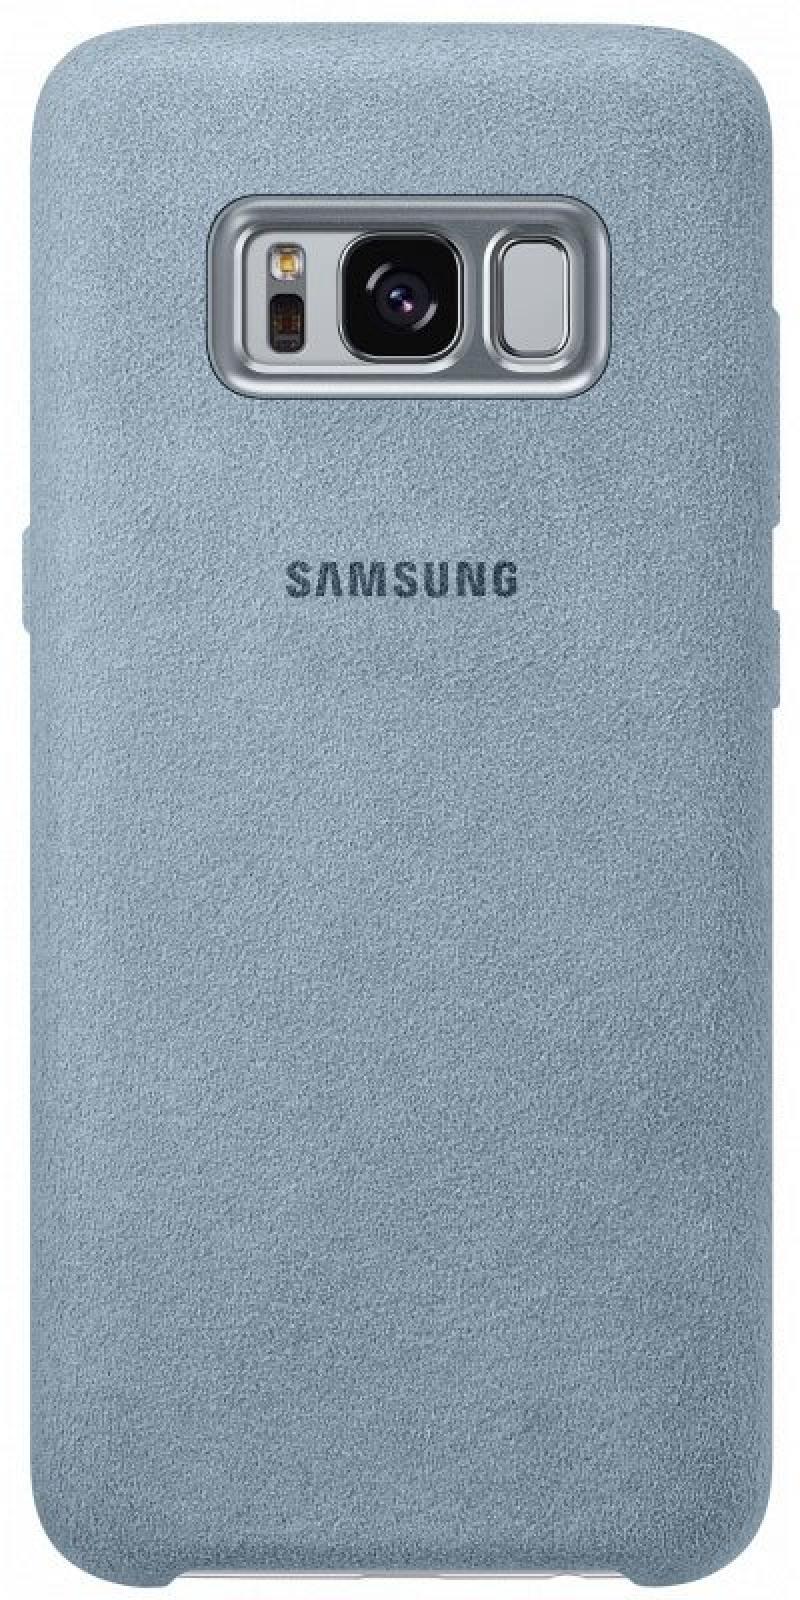 Чехол Samsung EF-XG950AMEGRU для Samsung Galaxy S8 Alcantara Cover голубой аксессуар чехол samsung galaxy s8 plus silicone cover purple ef pg955tvegru